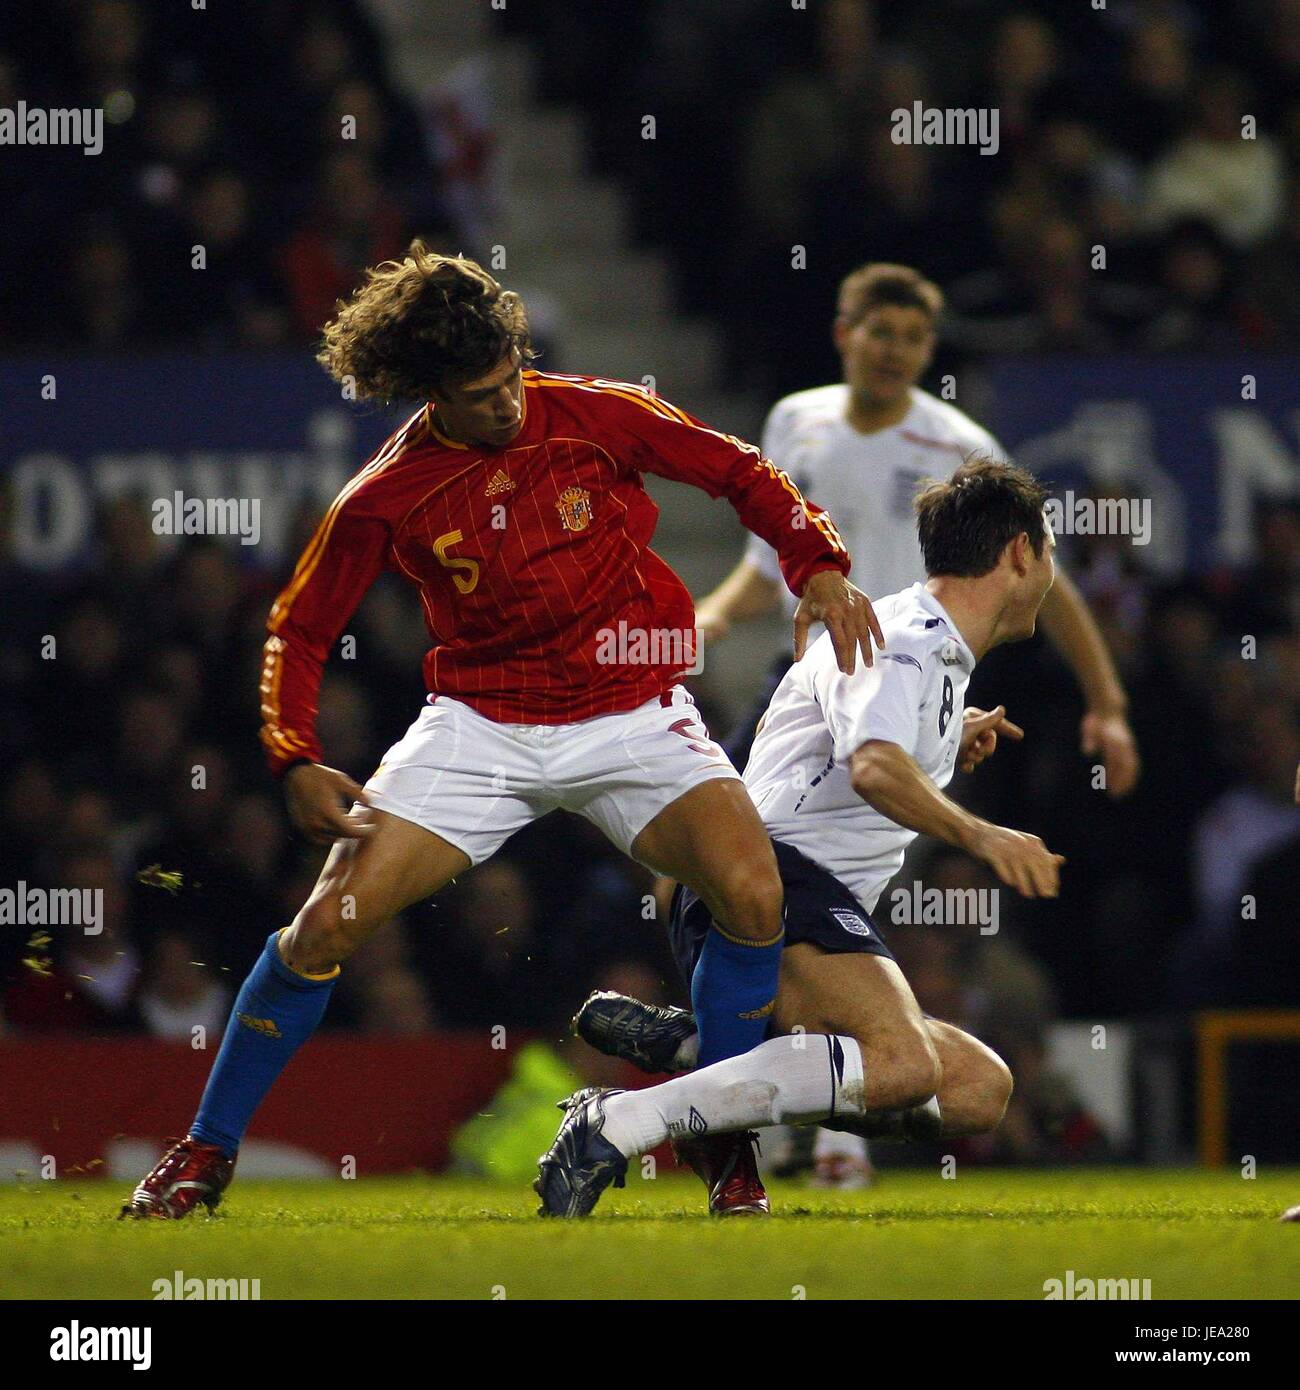 Sfide di Carles PUYOL LAMPARD INGHILTERRA V SPAGNA OLD TRAFFORD Manchester Inghilterra 07 Febbraio 2007 Immagini Stock